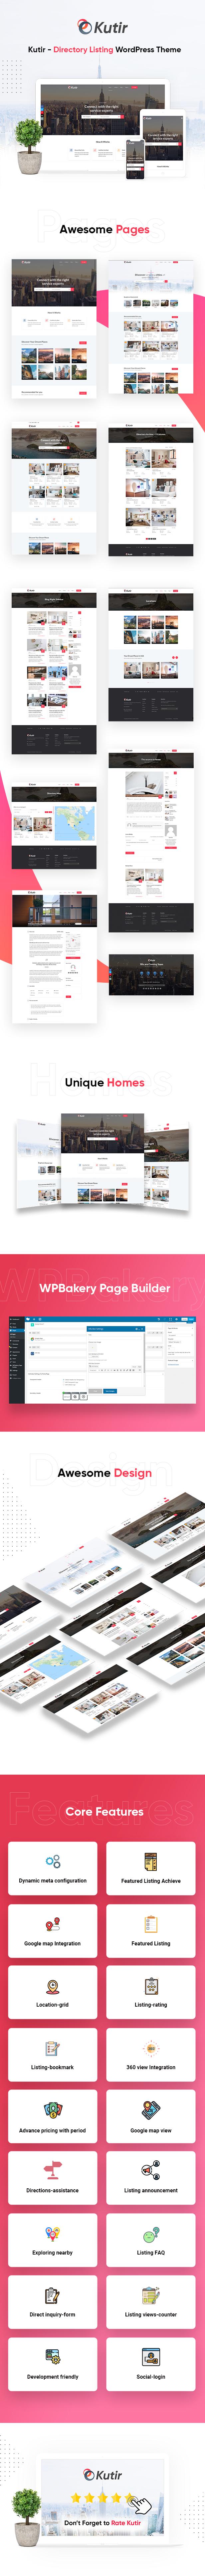 Kutir - Directory Listing WordPress Theme - 1